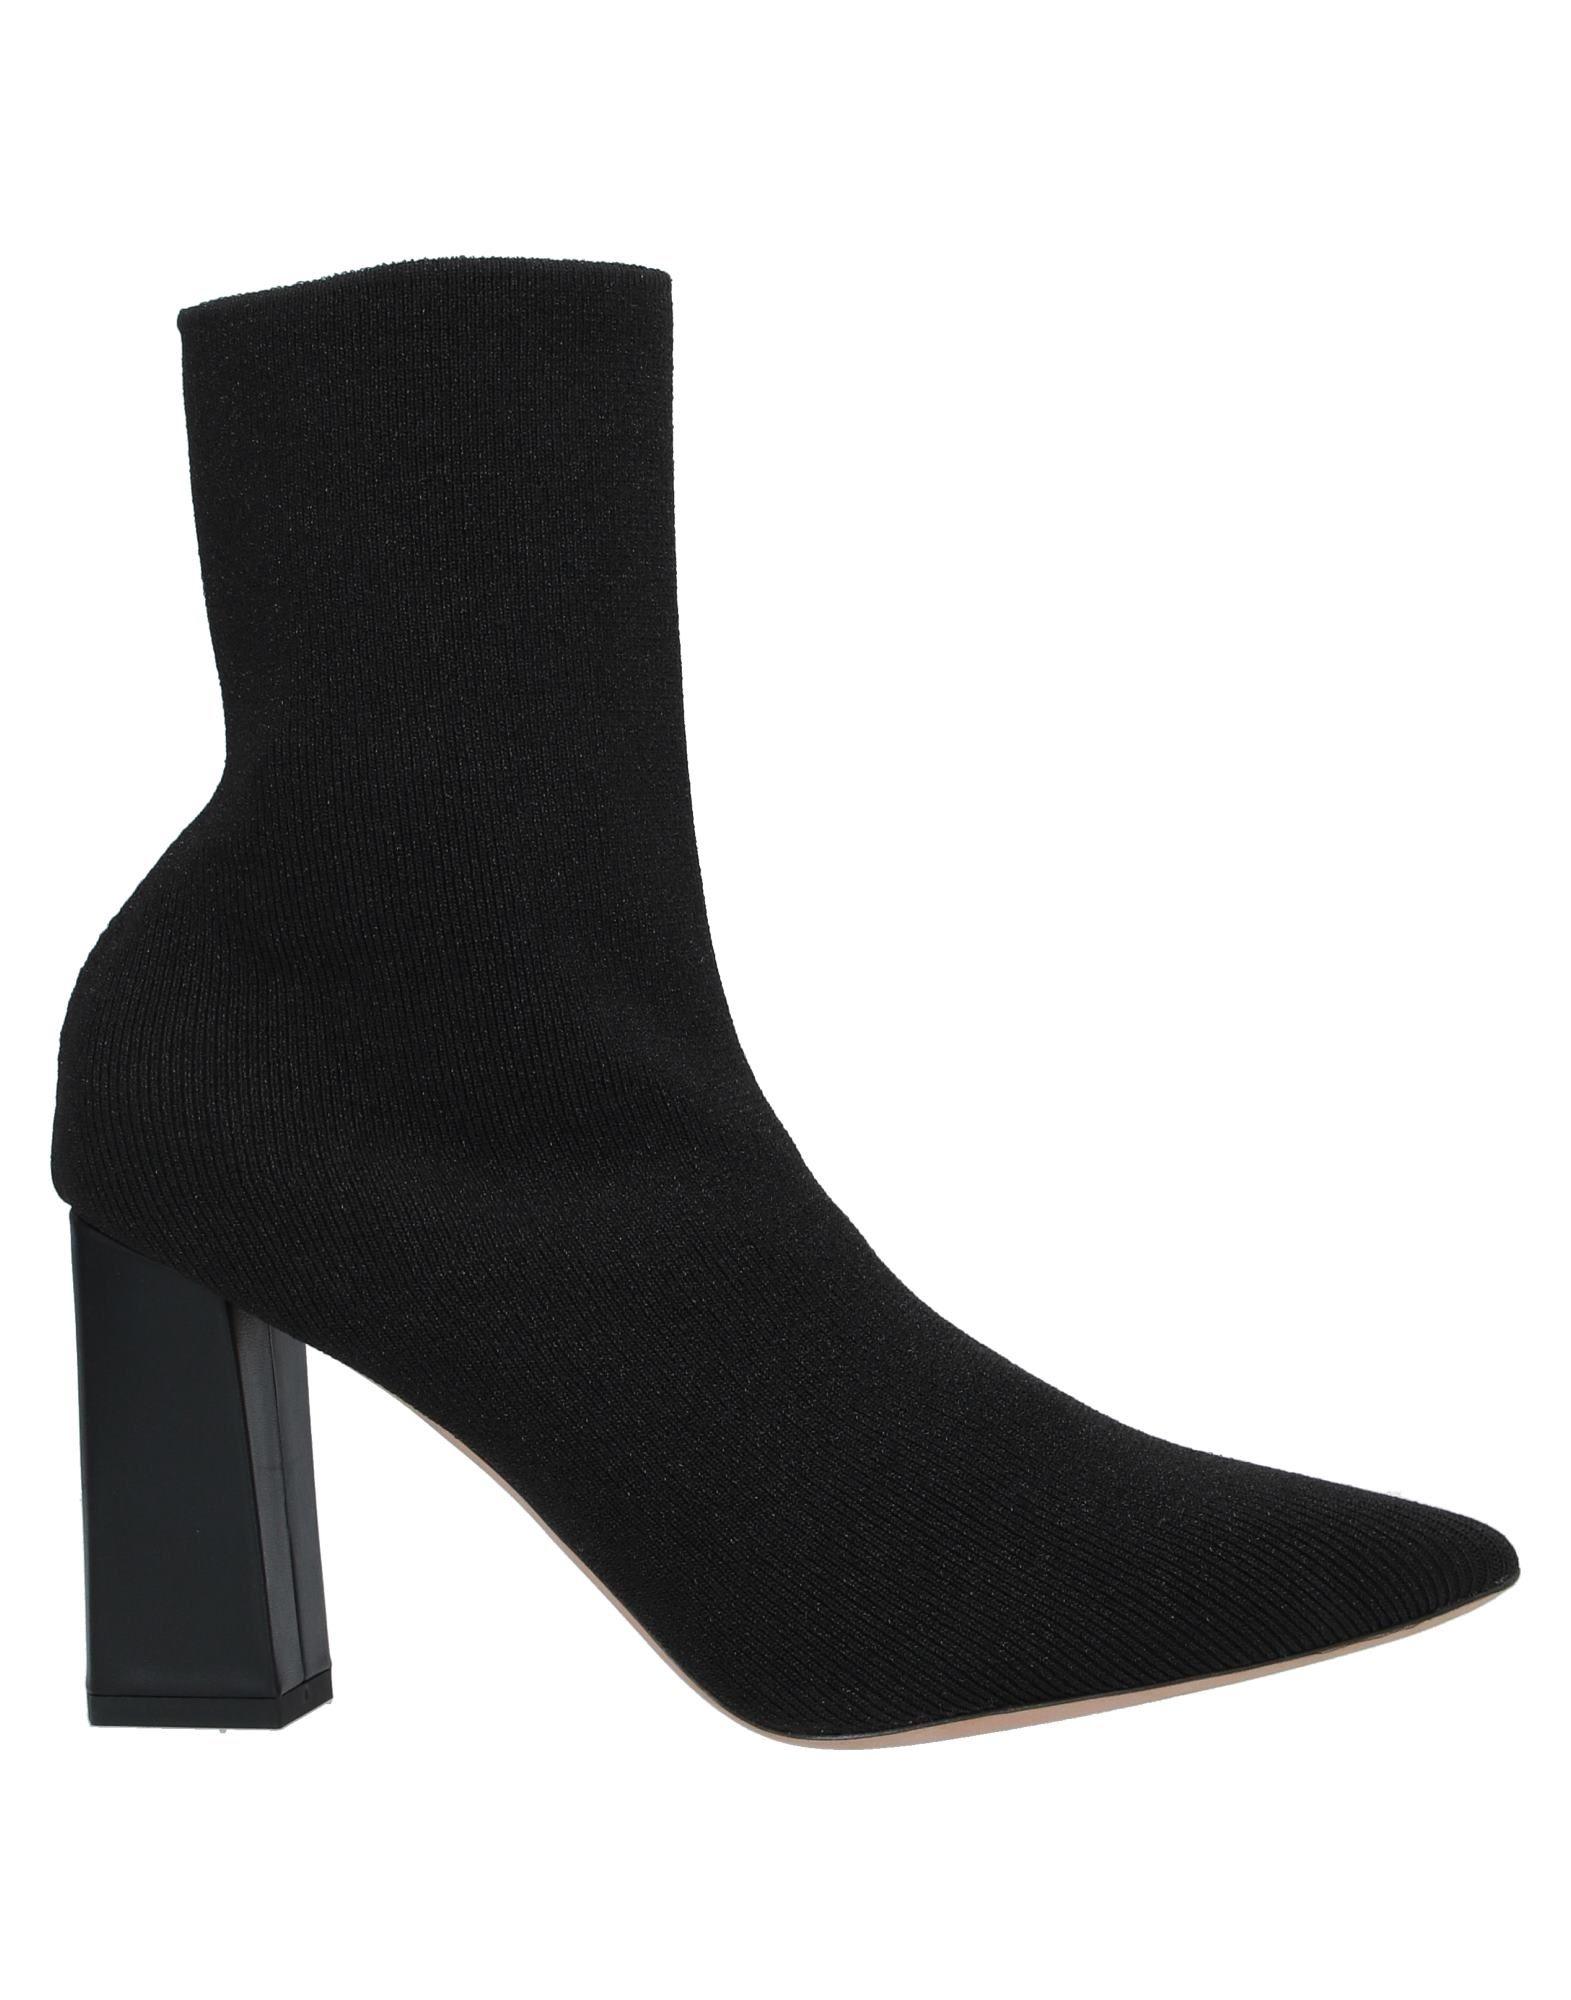 CHON per MARIO ZAMAGNA Полусапоги и высокие ботинки chon per mario zamagna сандалии